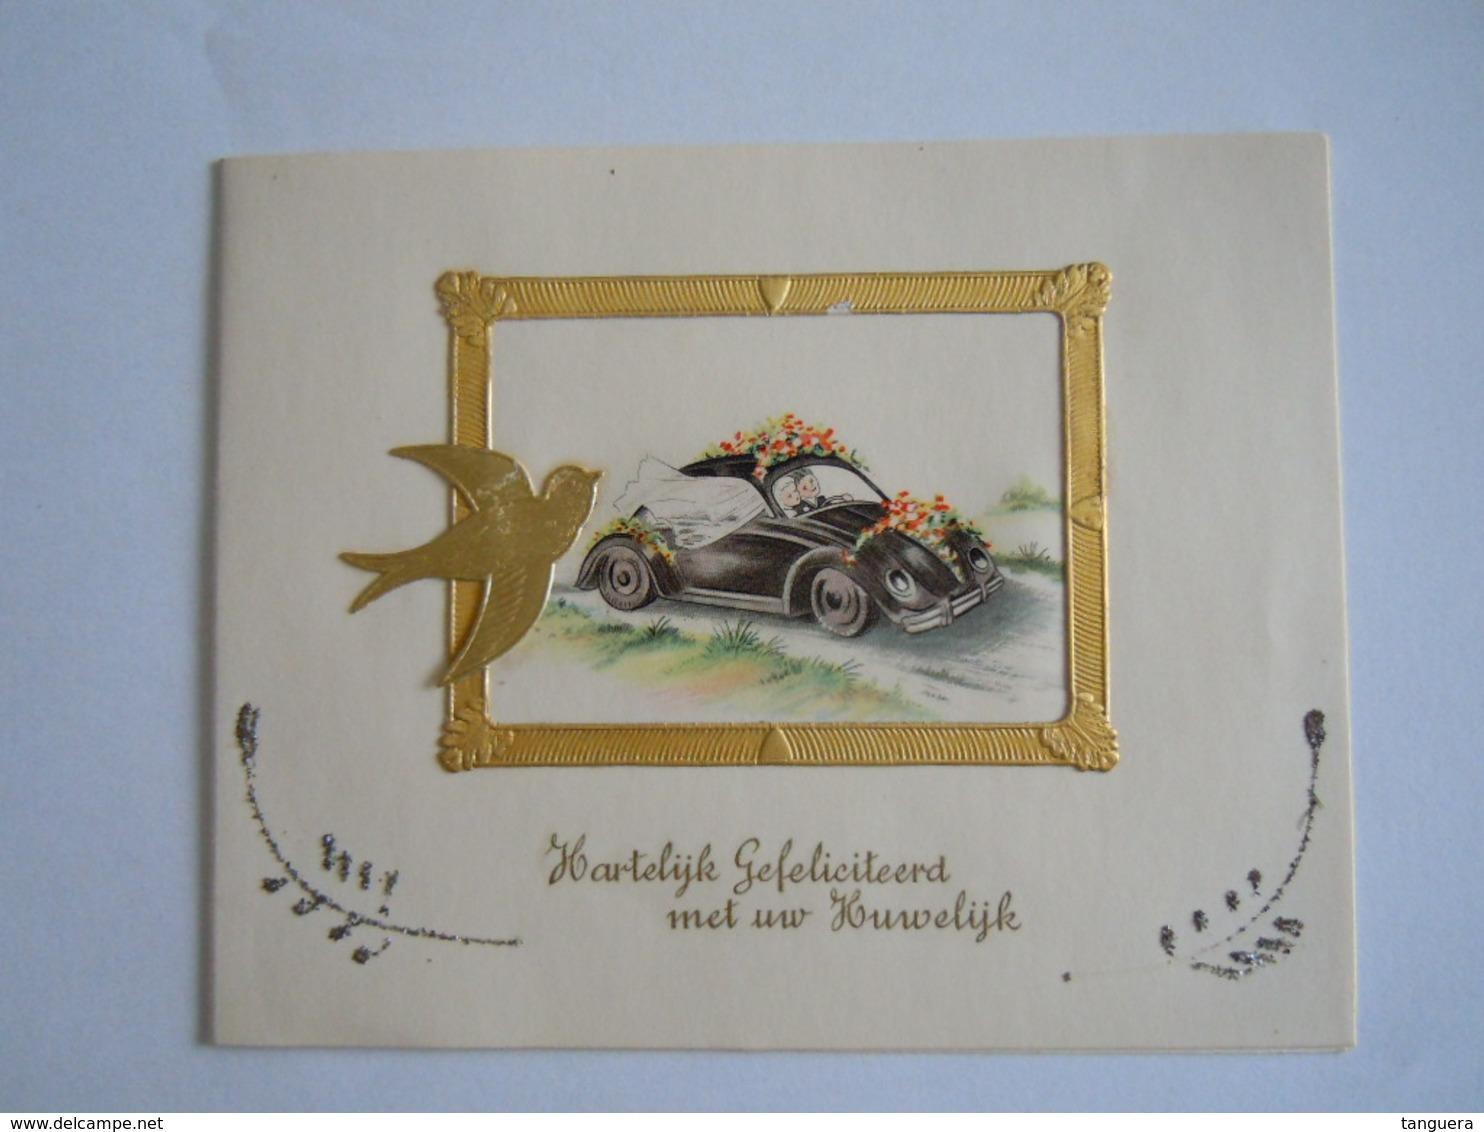 Felicitaties Huwelijk Felicitations De Mariage Carte Double Auto VW Coloprint 11336 Form 14 X 11 Cm - Holidays & Celebrations